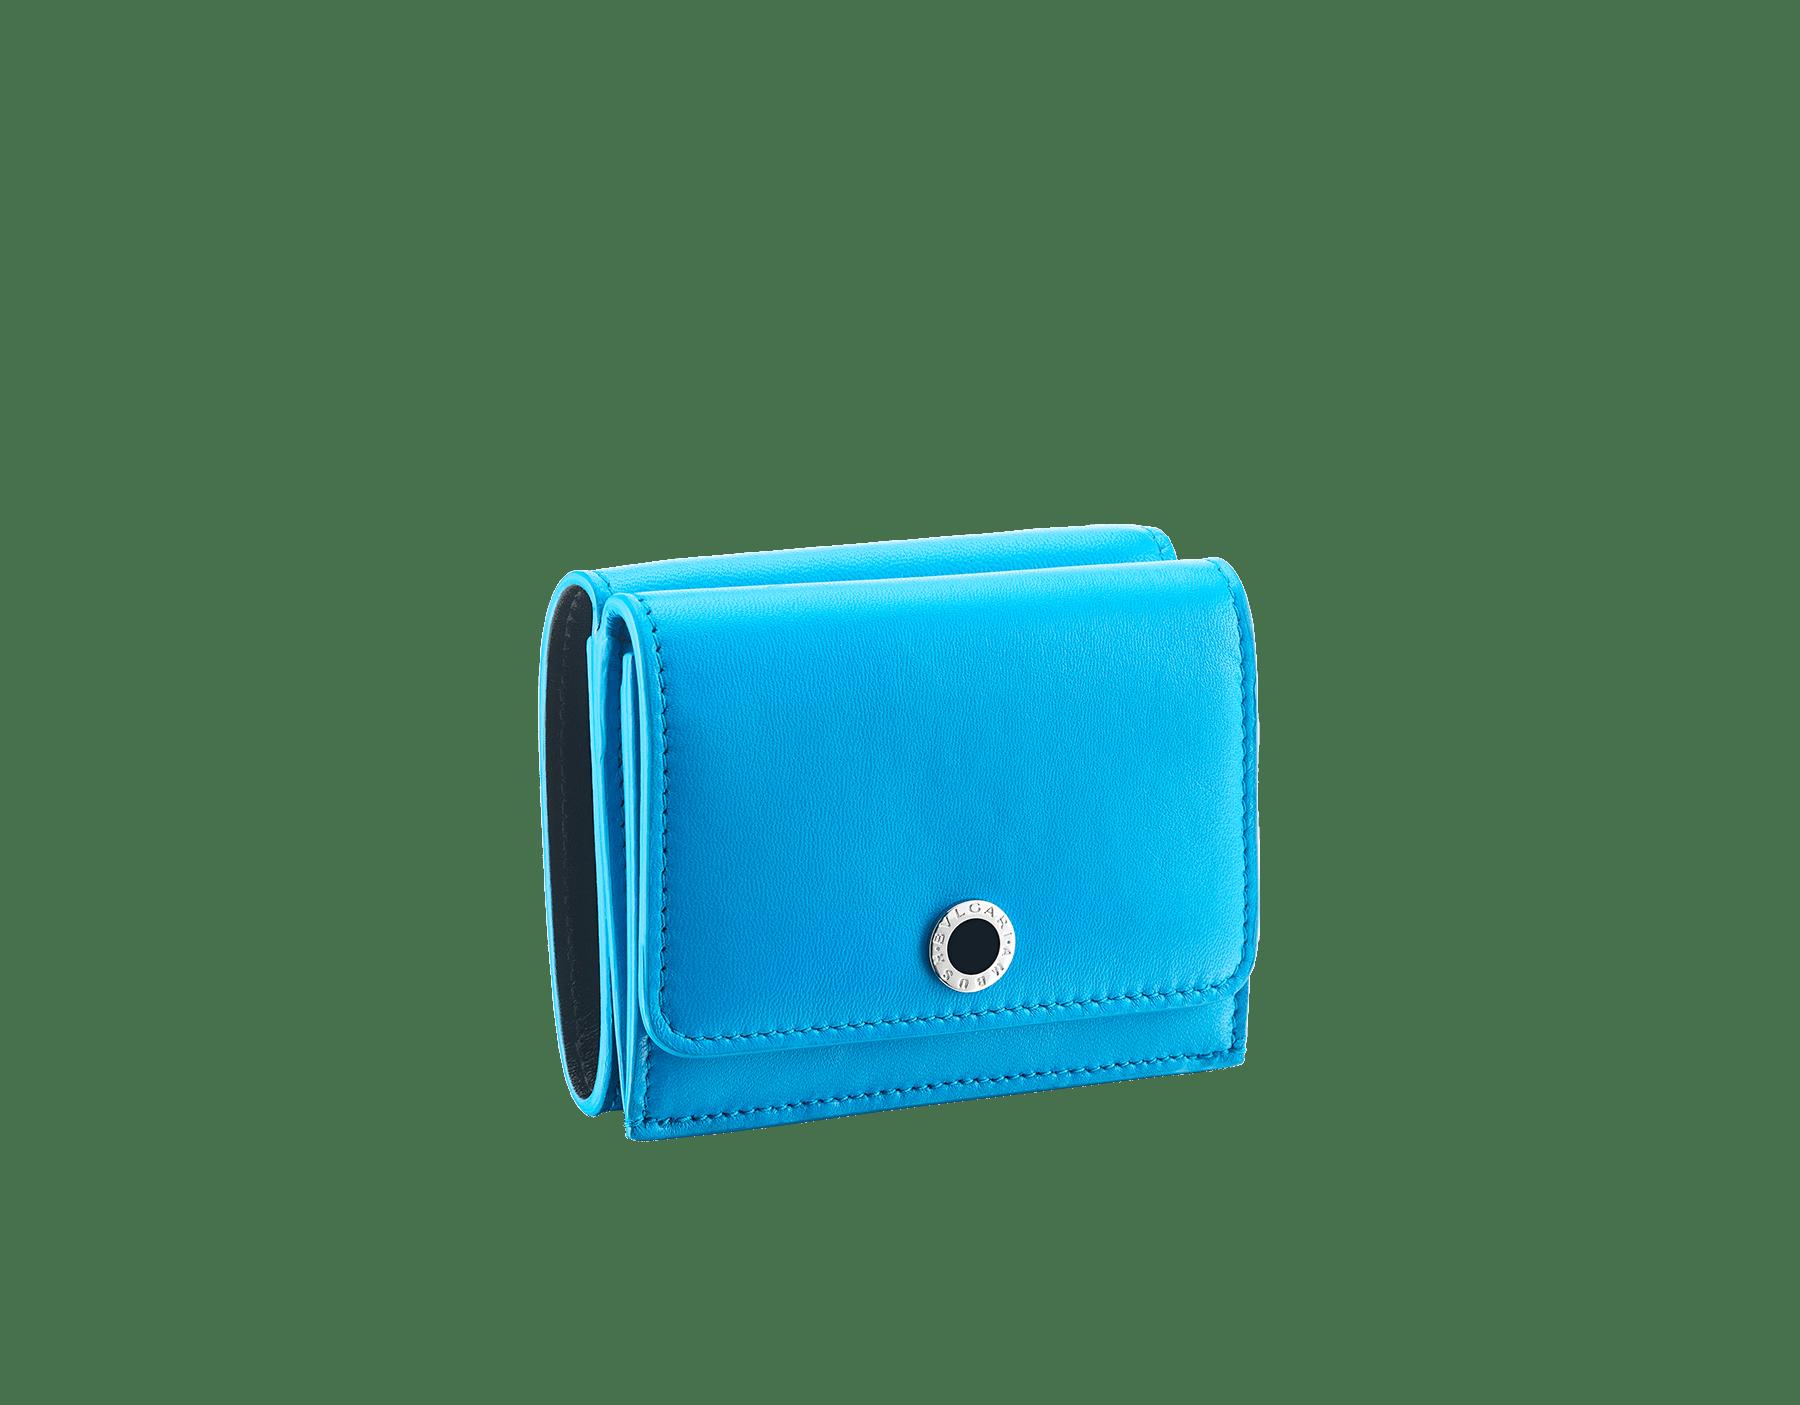 """Ambush x Bvlgari"" mini compact wallet in bright blue nappa leather. Palladium plated brass ""BVLGARI AMBUSH"" décor enameled in black on one side and special ""BVLGARI AMBUSH"" logo print on the other. Limited edition. YA-MINICOMPACT image 1"